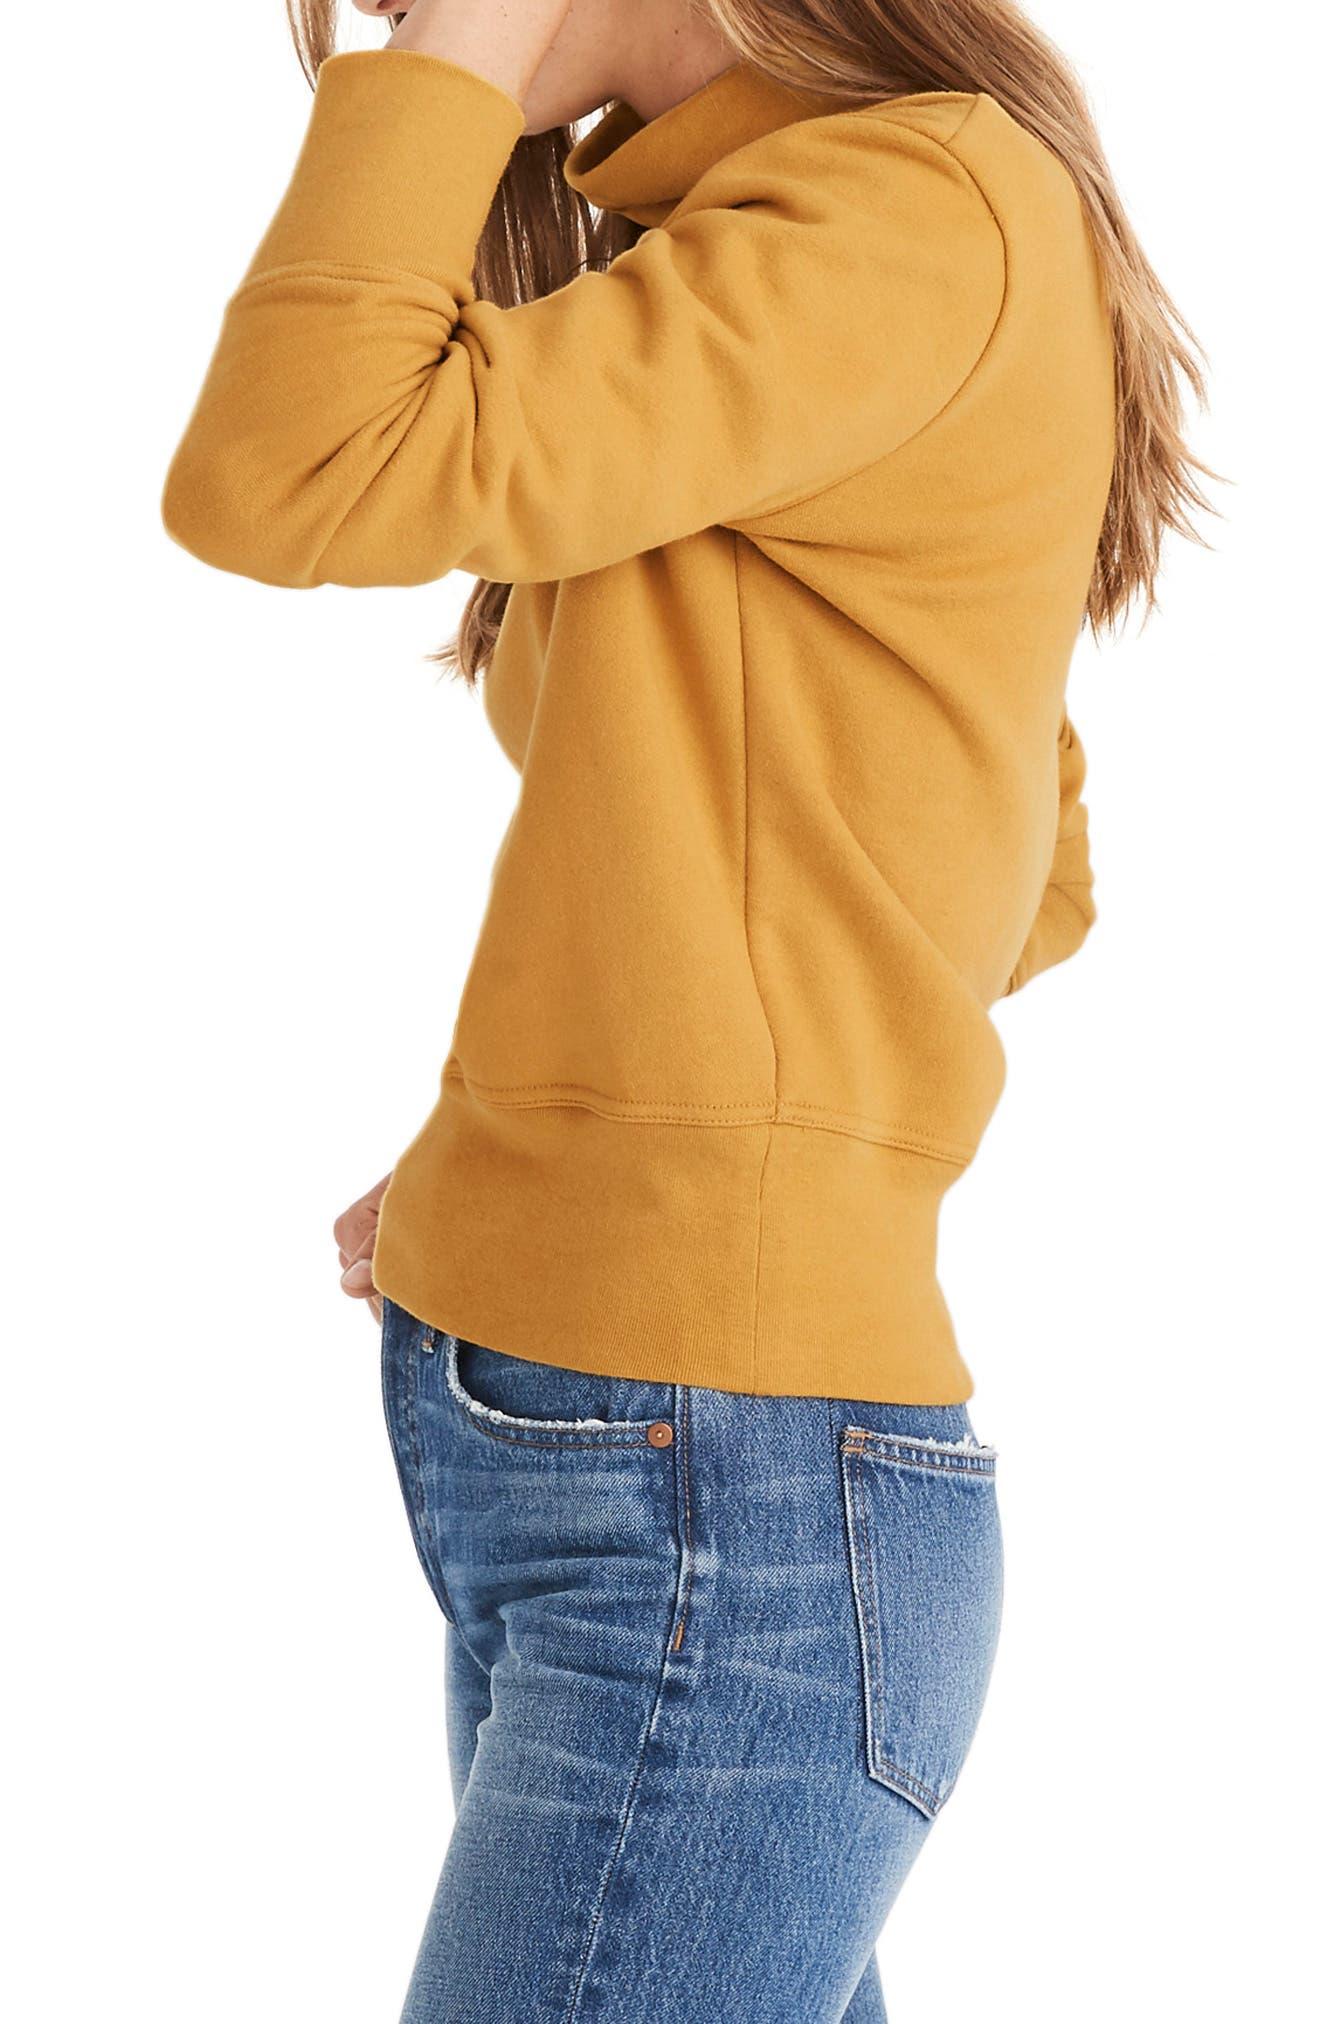 Turtleneck Sweatshirt,                             Alternate thumbnail 3, color,                             NECTAR GOLD